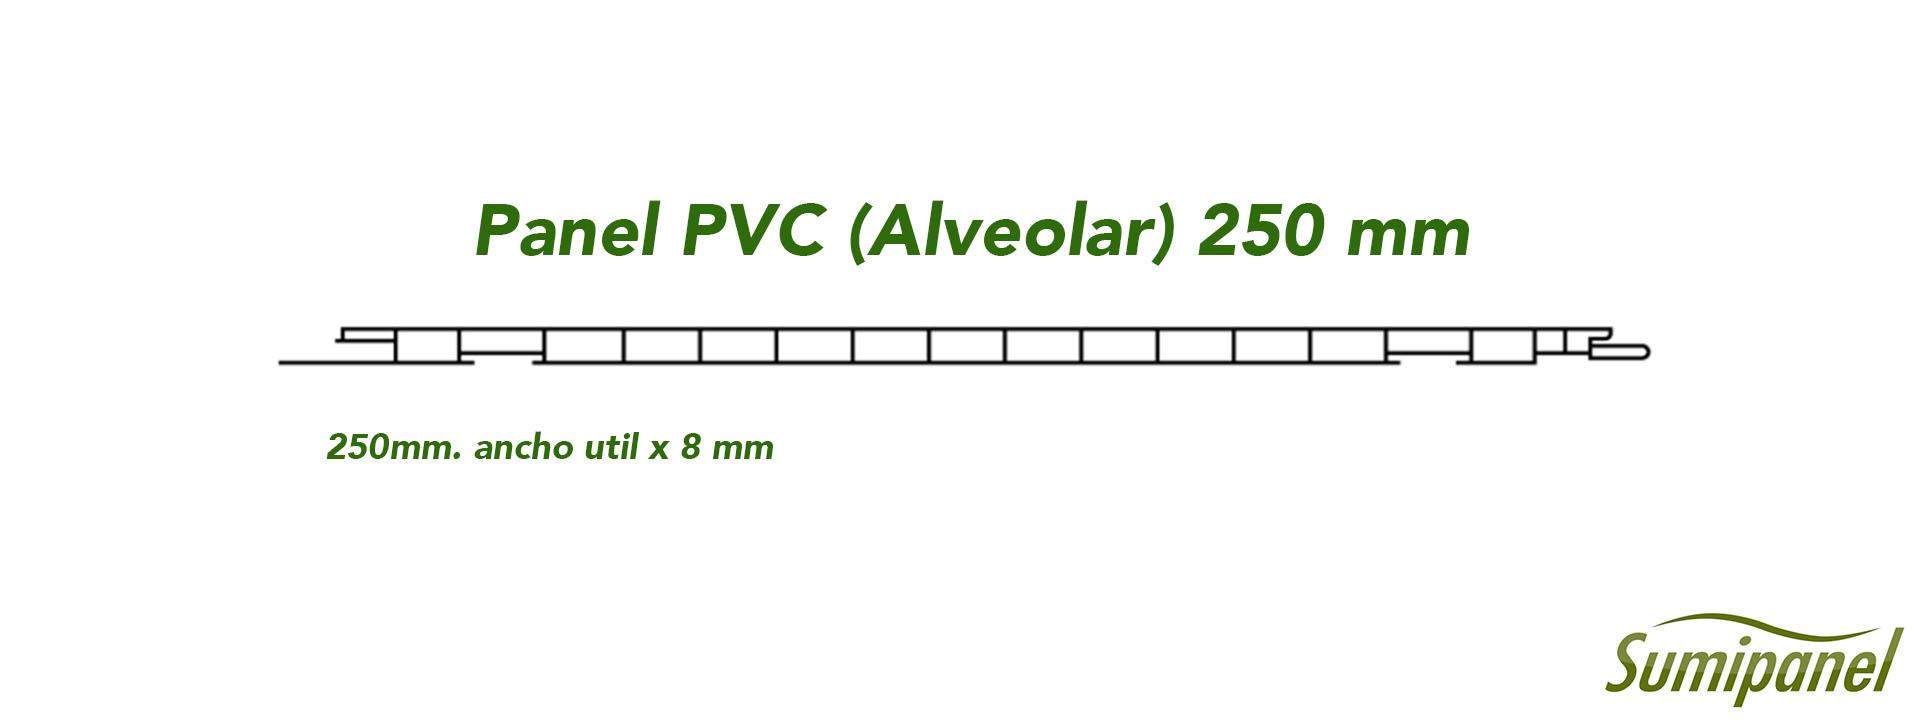 Panel Alveolar